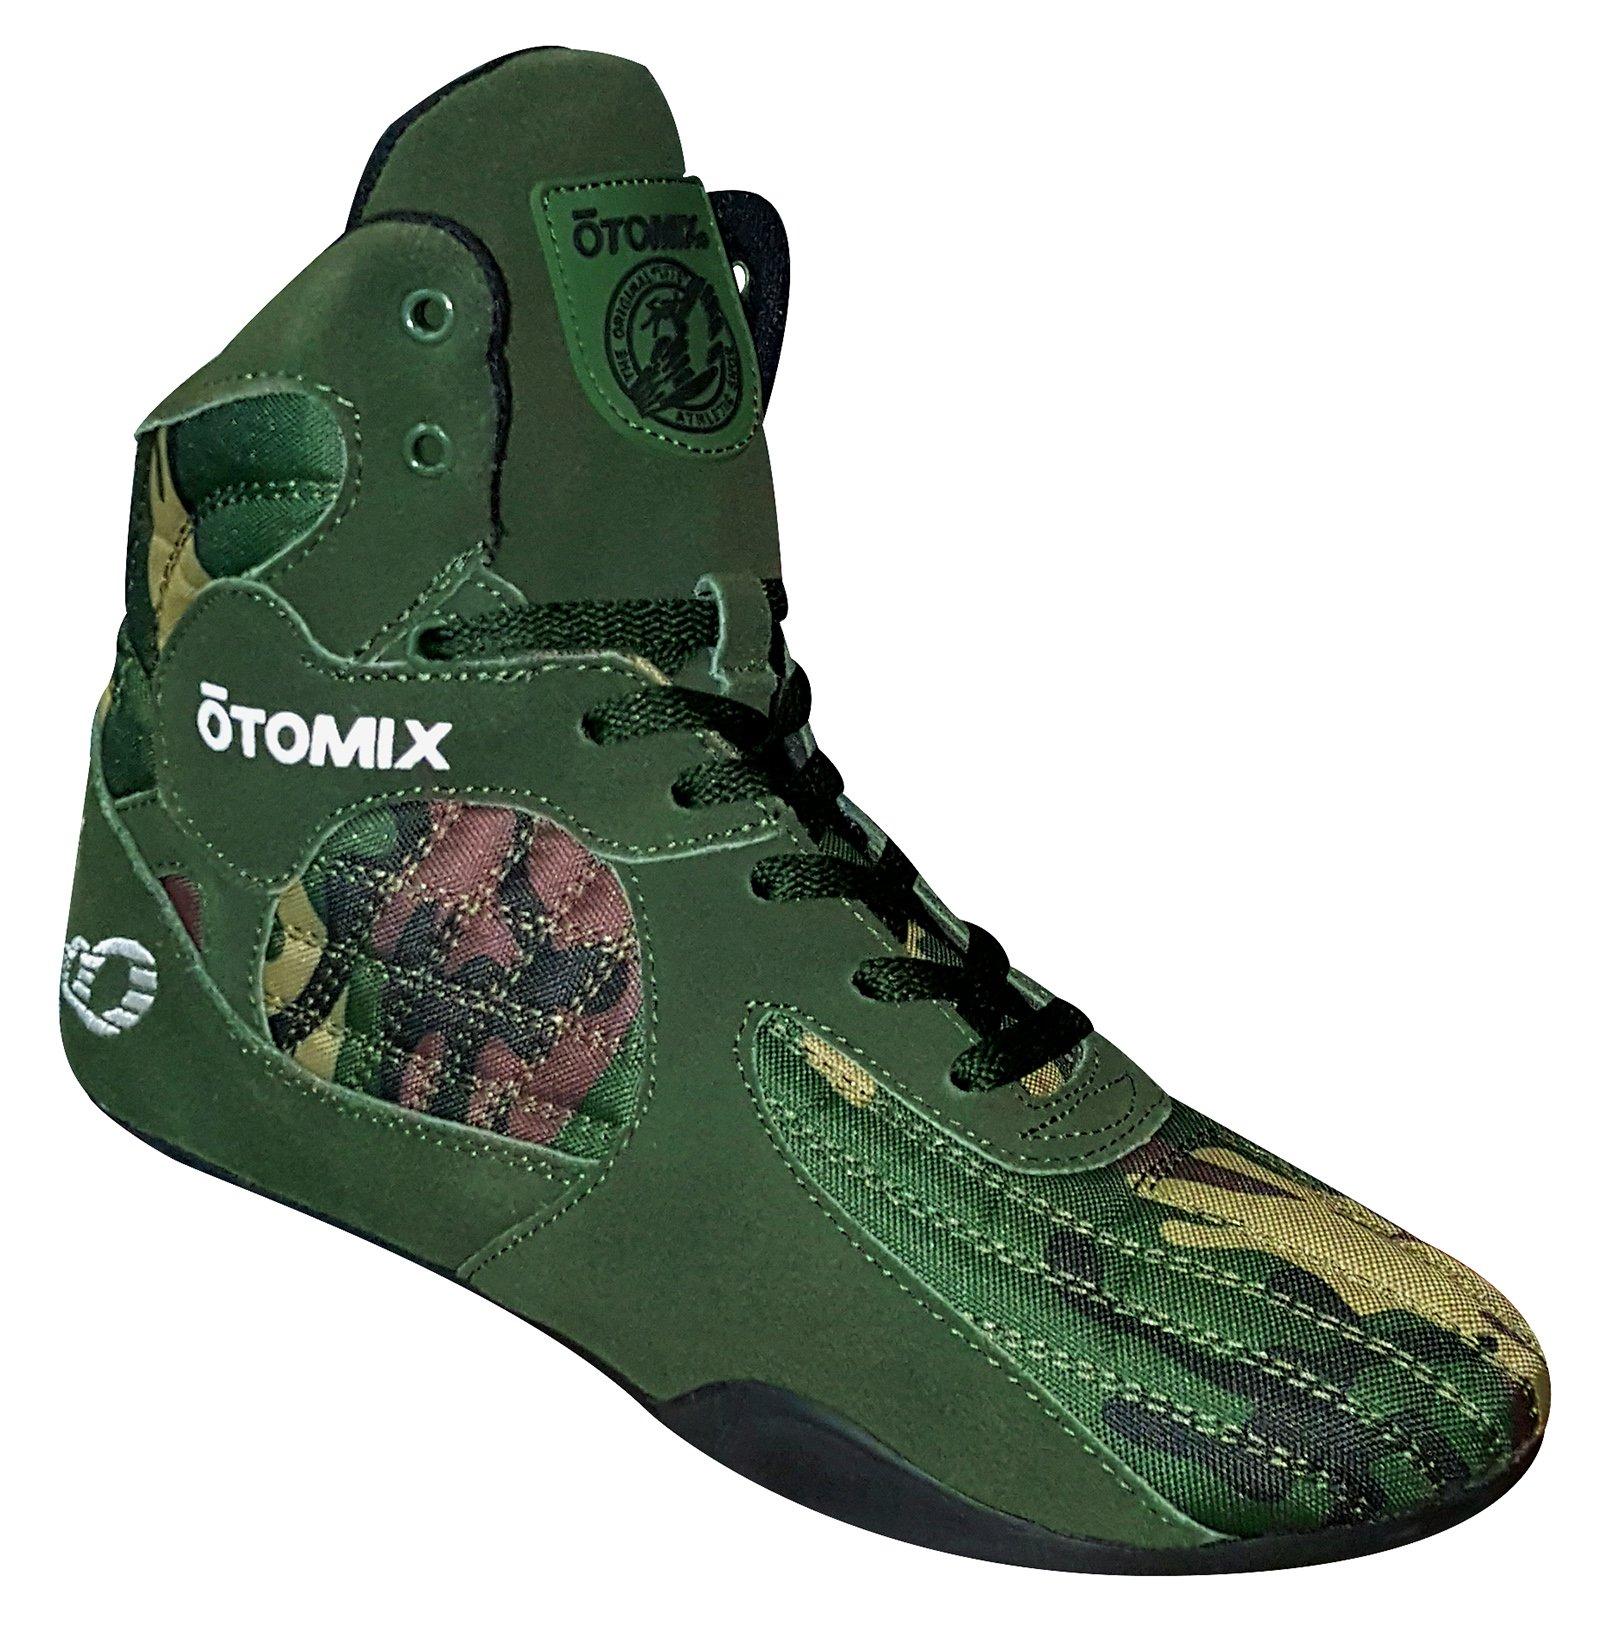 265905eb42f7 Otomix Men s Stingray Escape Bodybuilding Lifting MMA   Wrestling Shoes